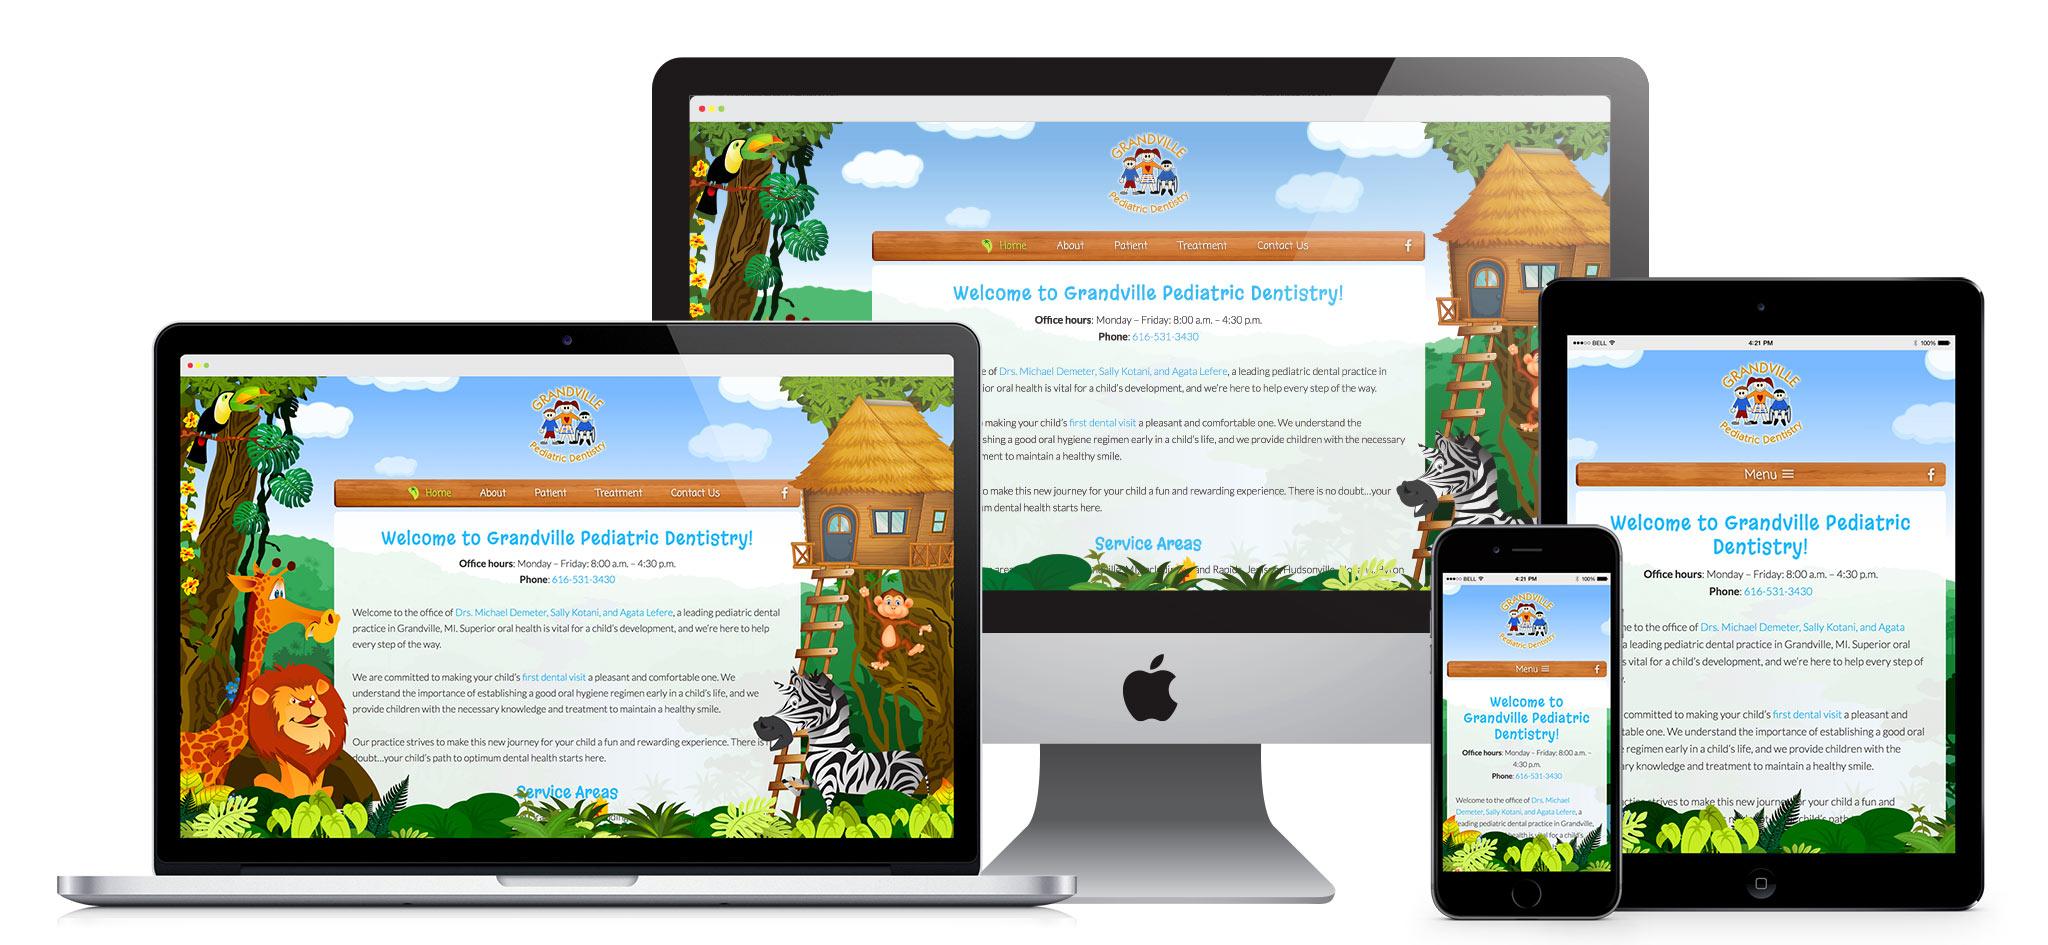 Grandville Pediatric Dentistry website screenshots